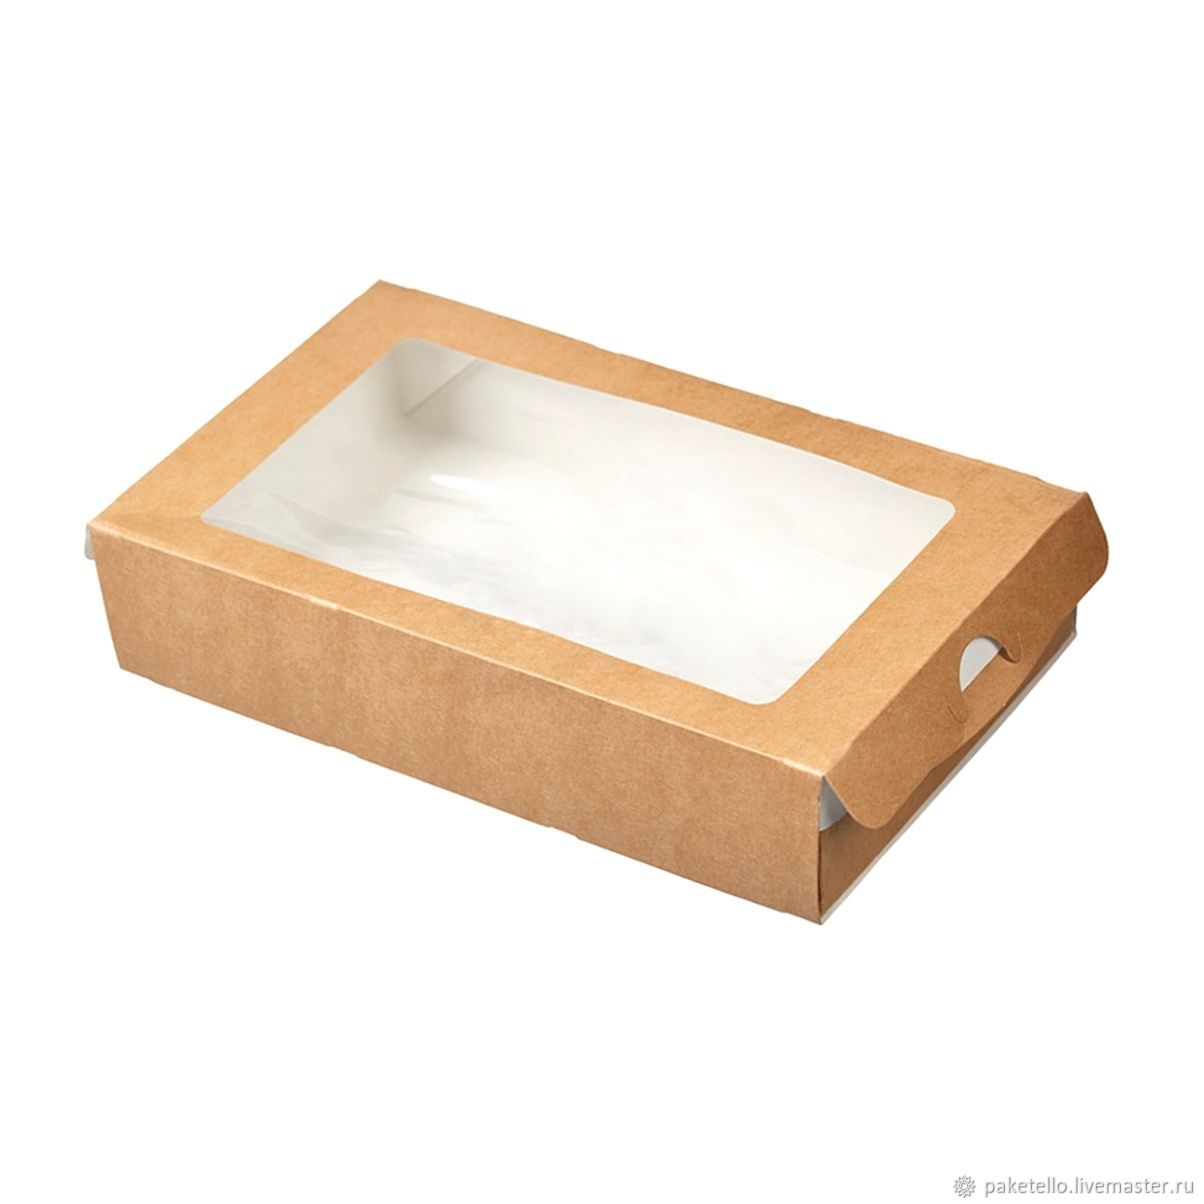 Коробка-пенал с окном - 200х120х40 мм, Коробки, Москва,  Фото №1